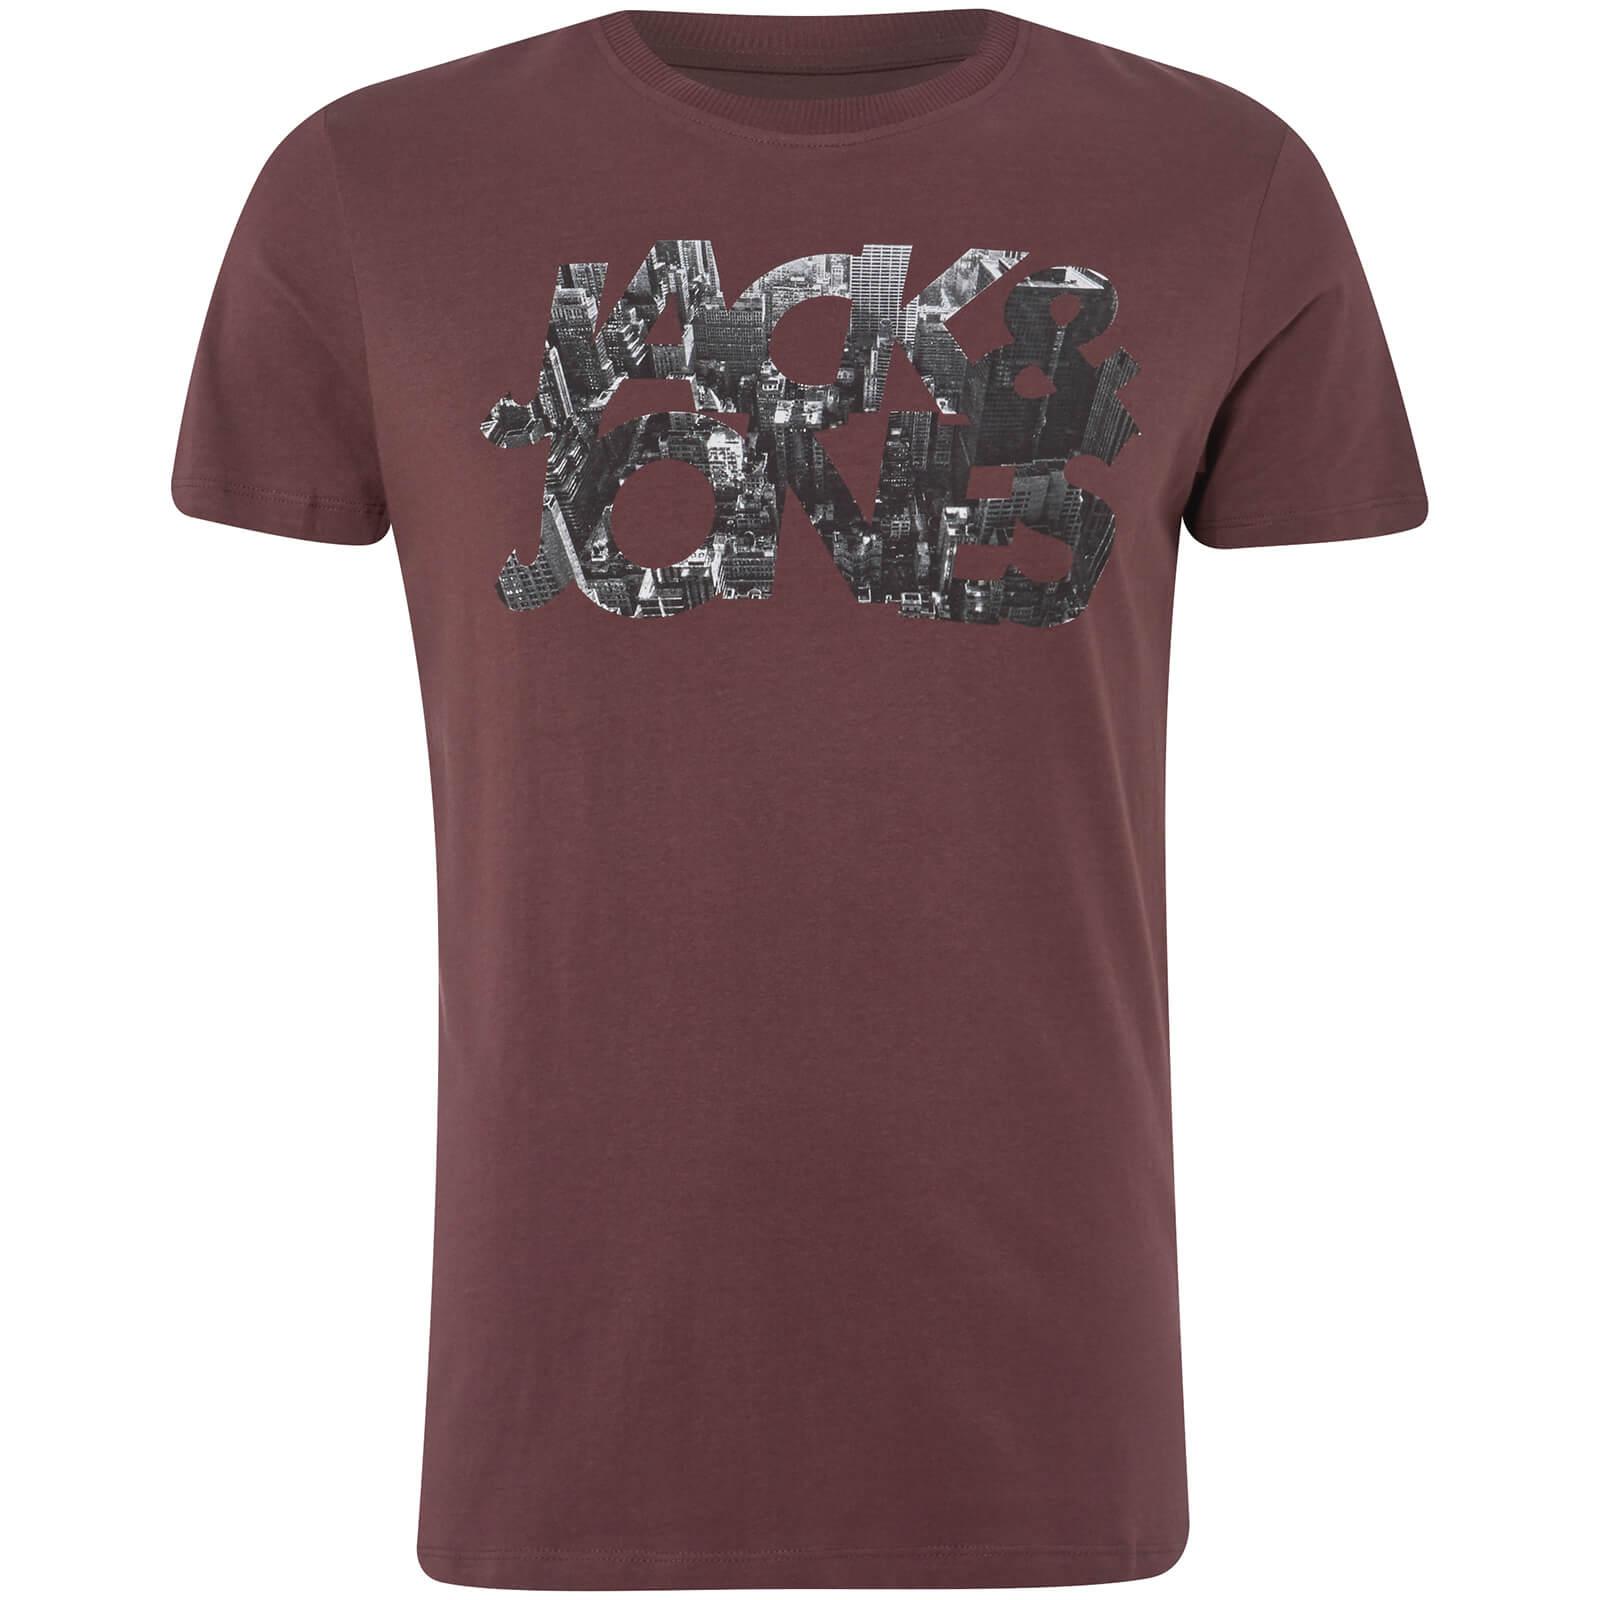 Jack   Jones Core Men s Scallop T-Shirt - Fudge Clothing  24908bb11